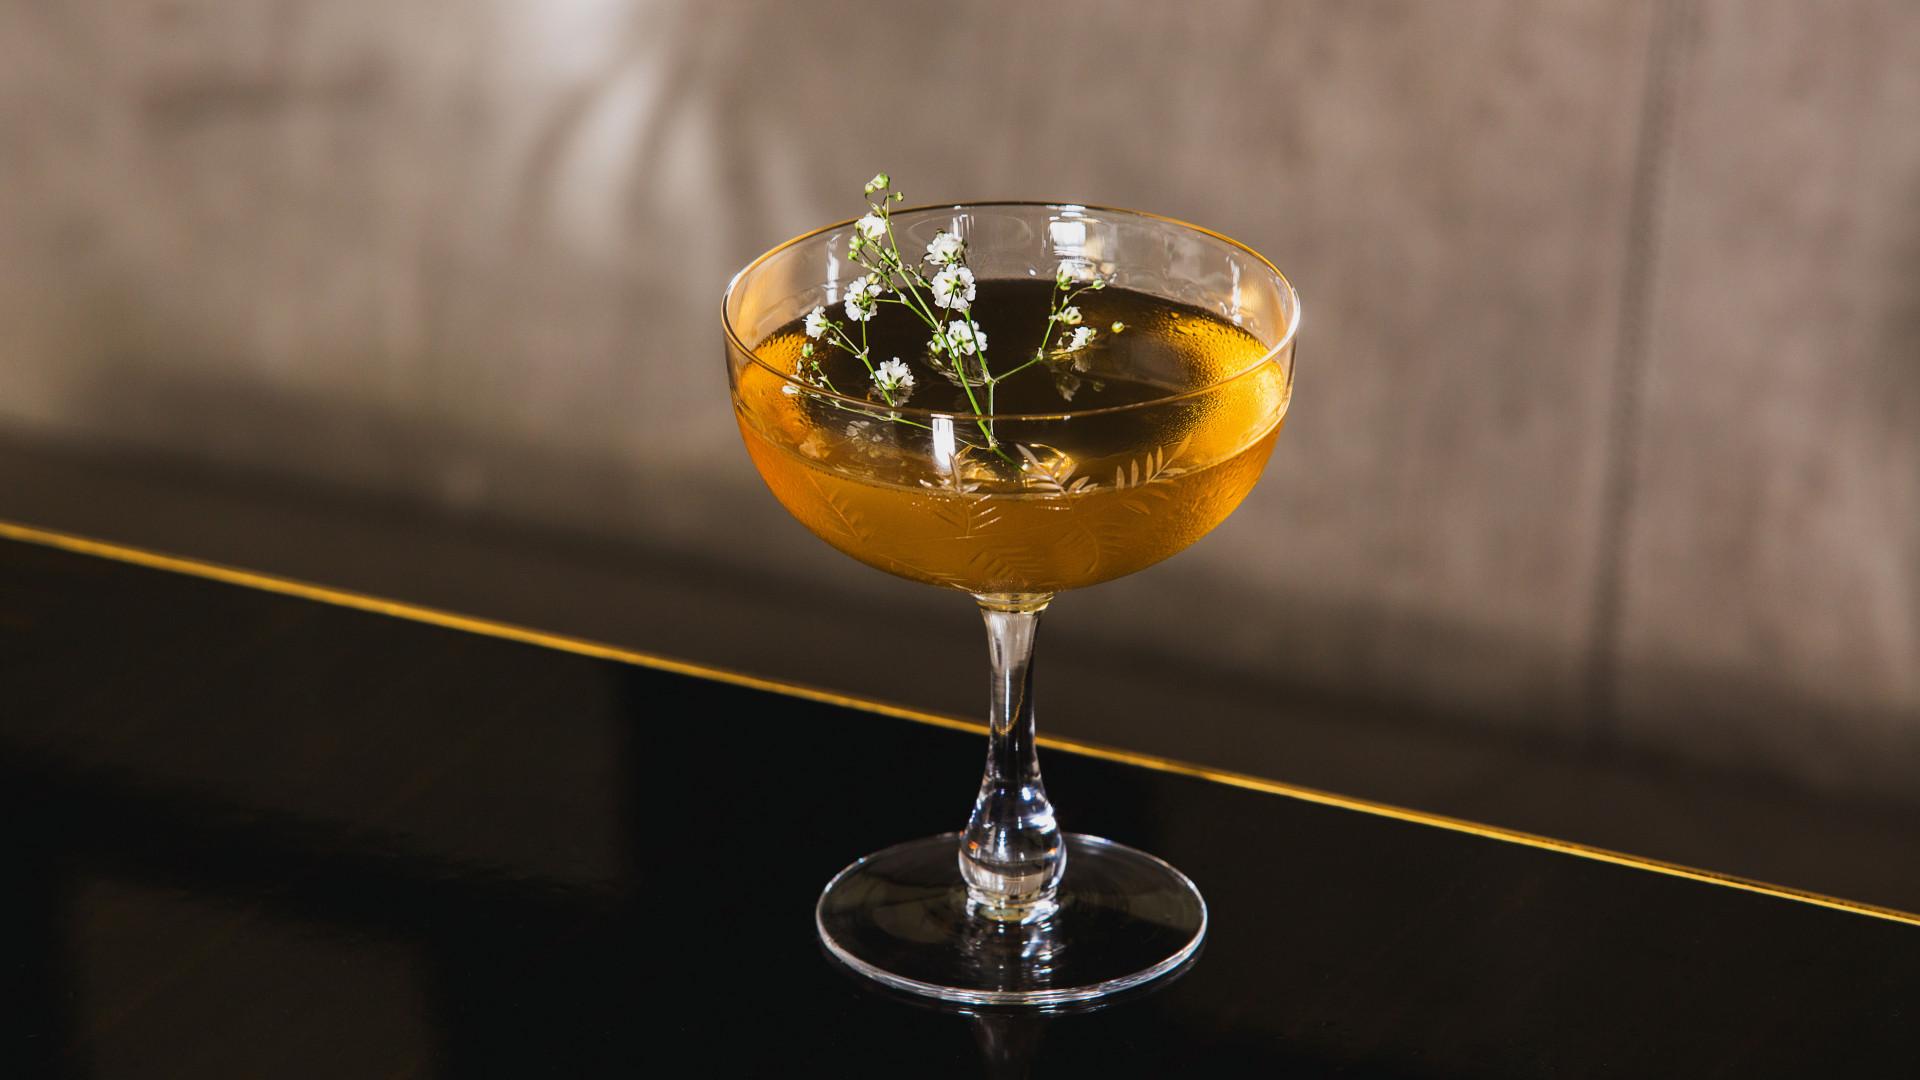 Meadowsweet Martini from the Bassoon Bar at the Corinthia Hotel London